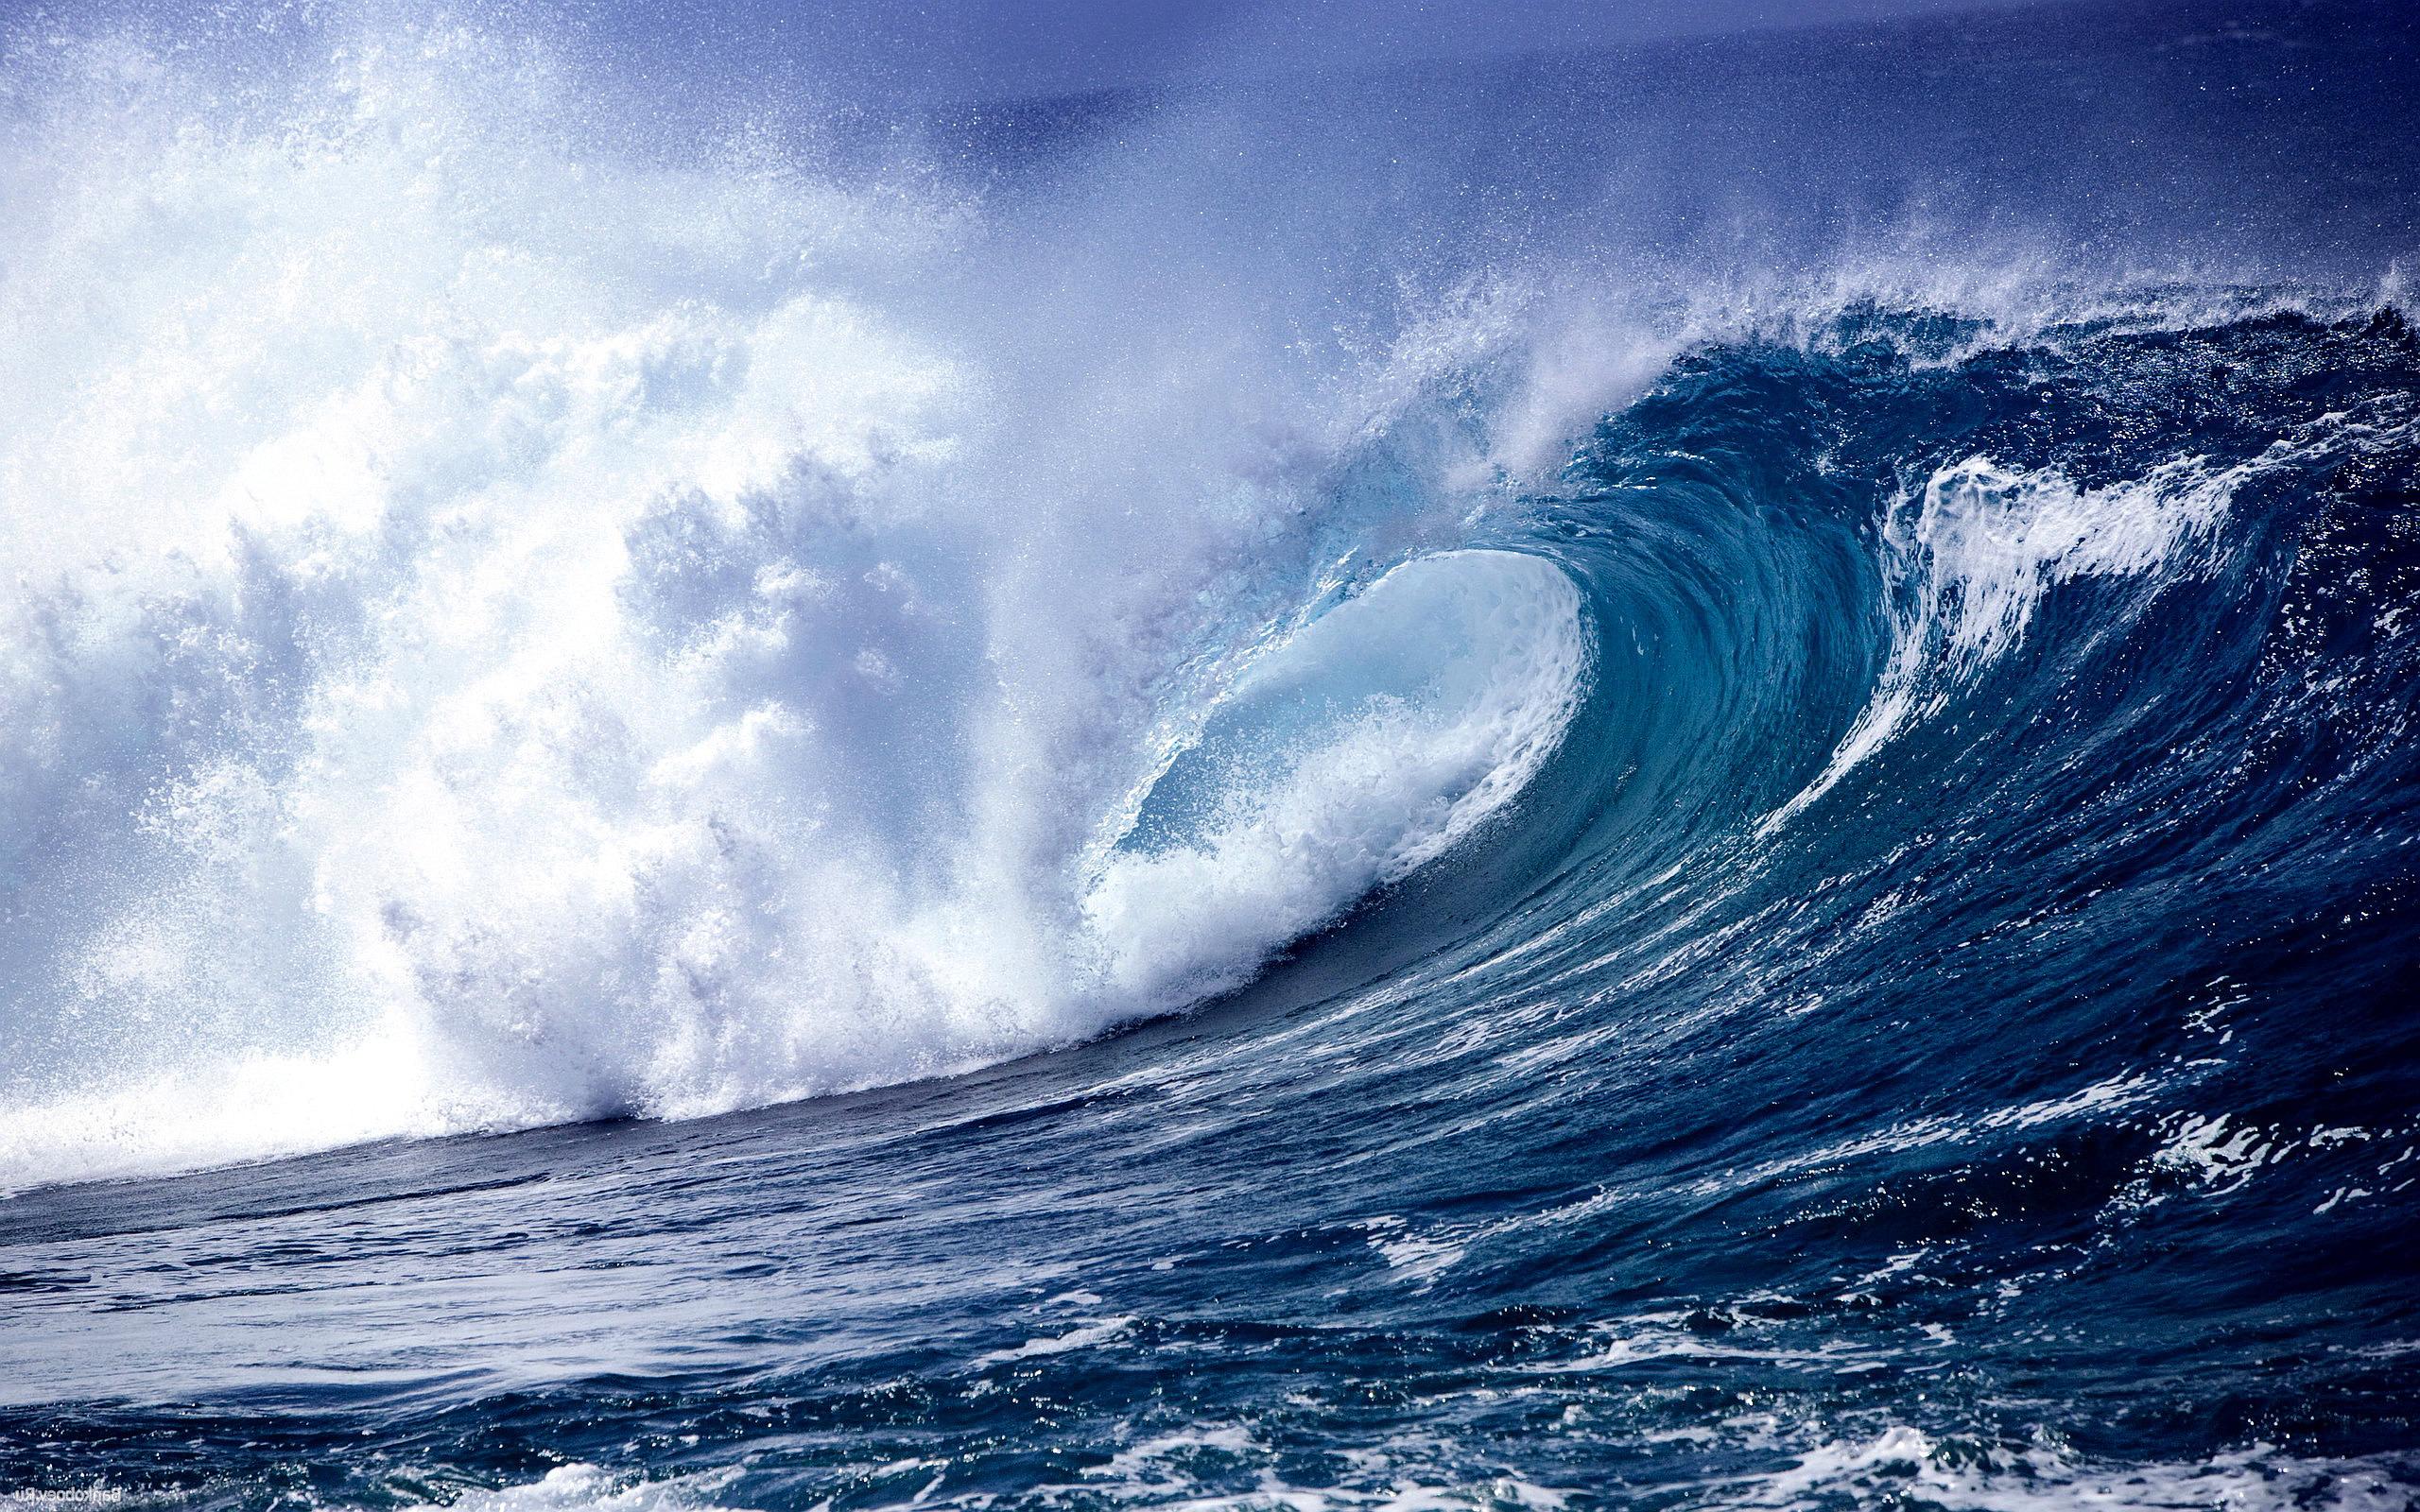 Ocean Wave Desktop Backgrounds wallpaper wallpaper hd background 2560x1600